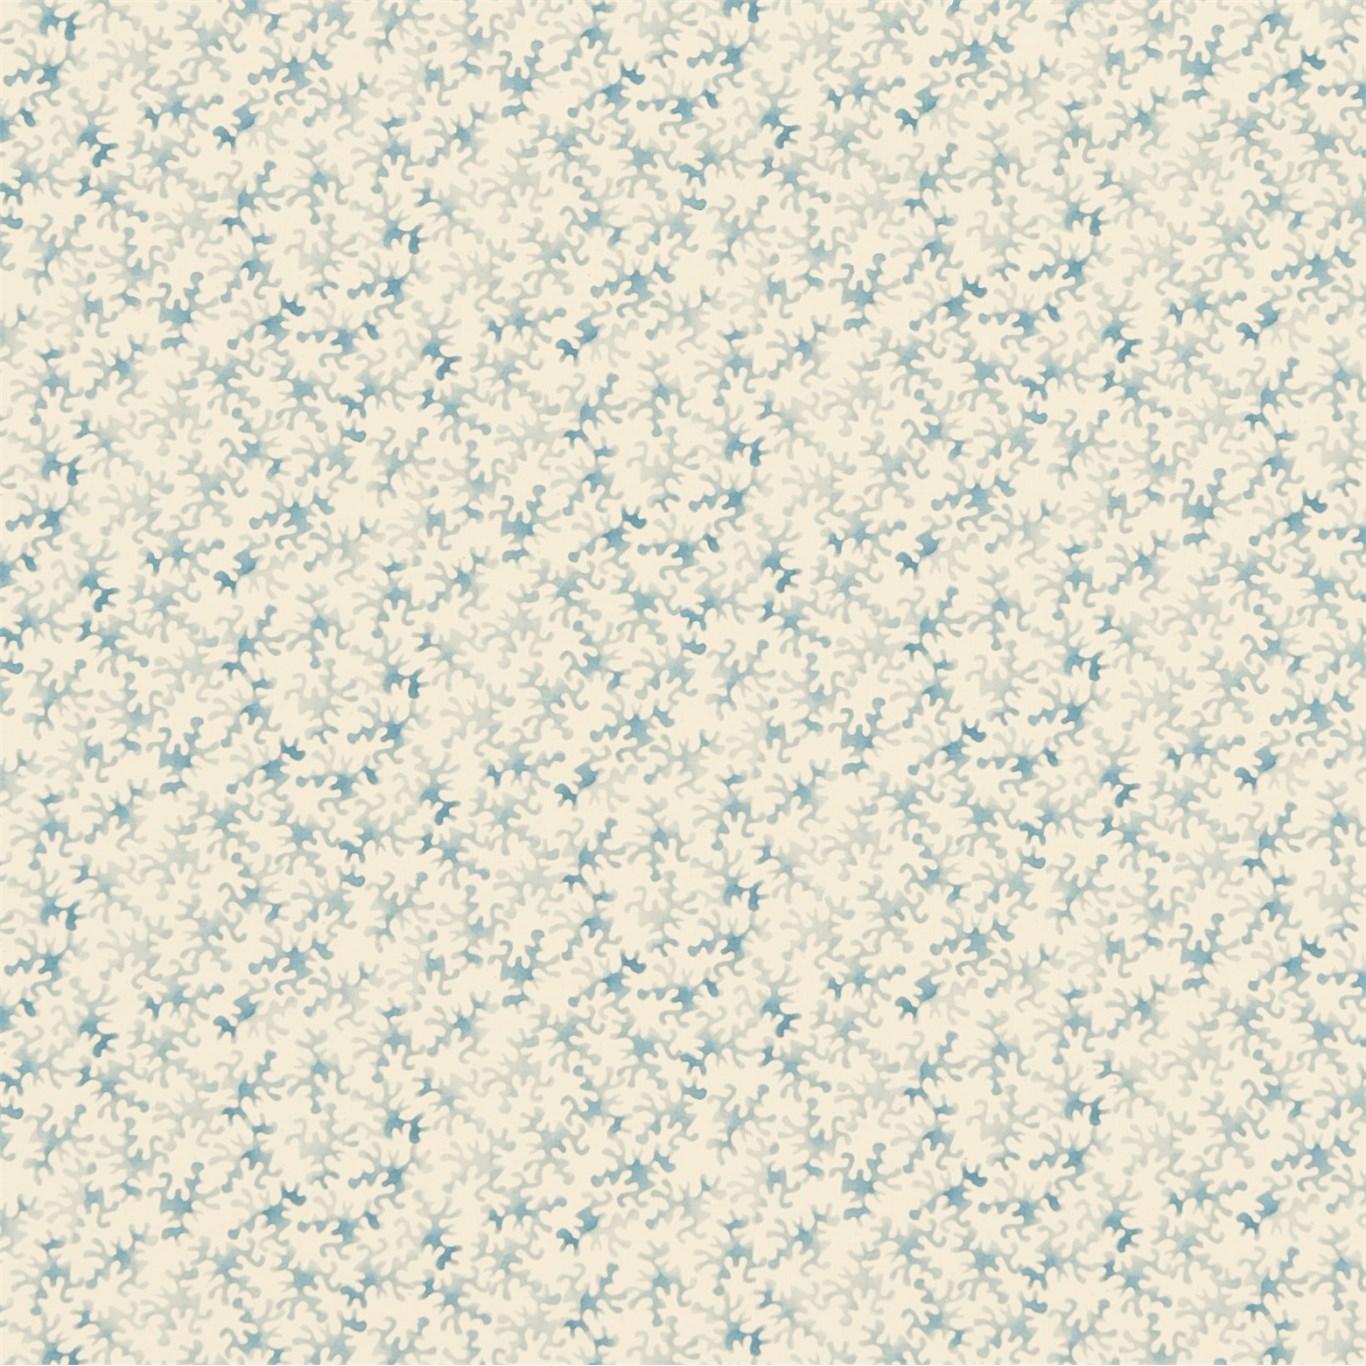 EB Tyg Coral Ljusblå